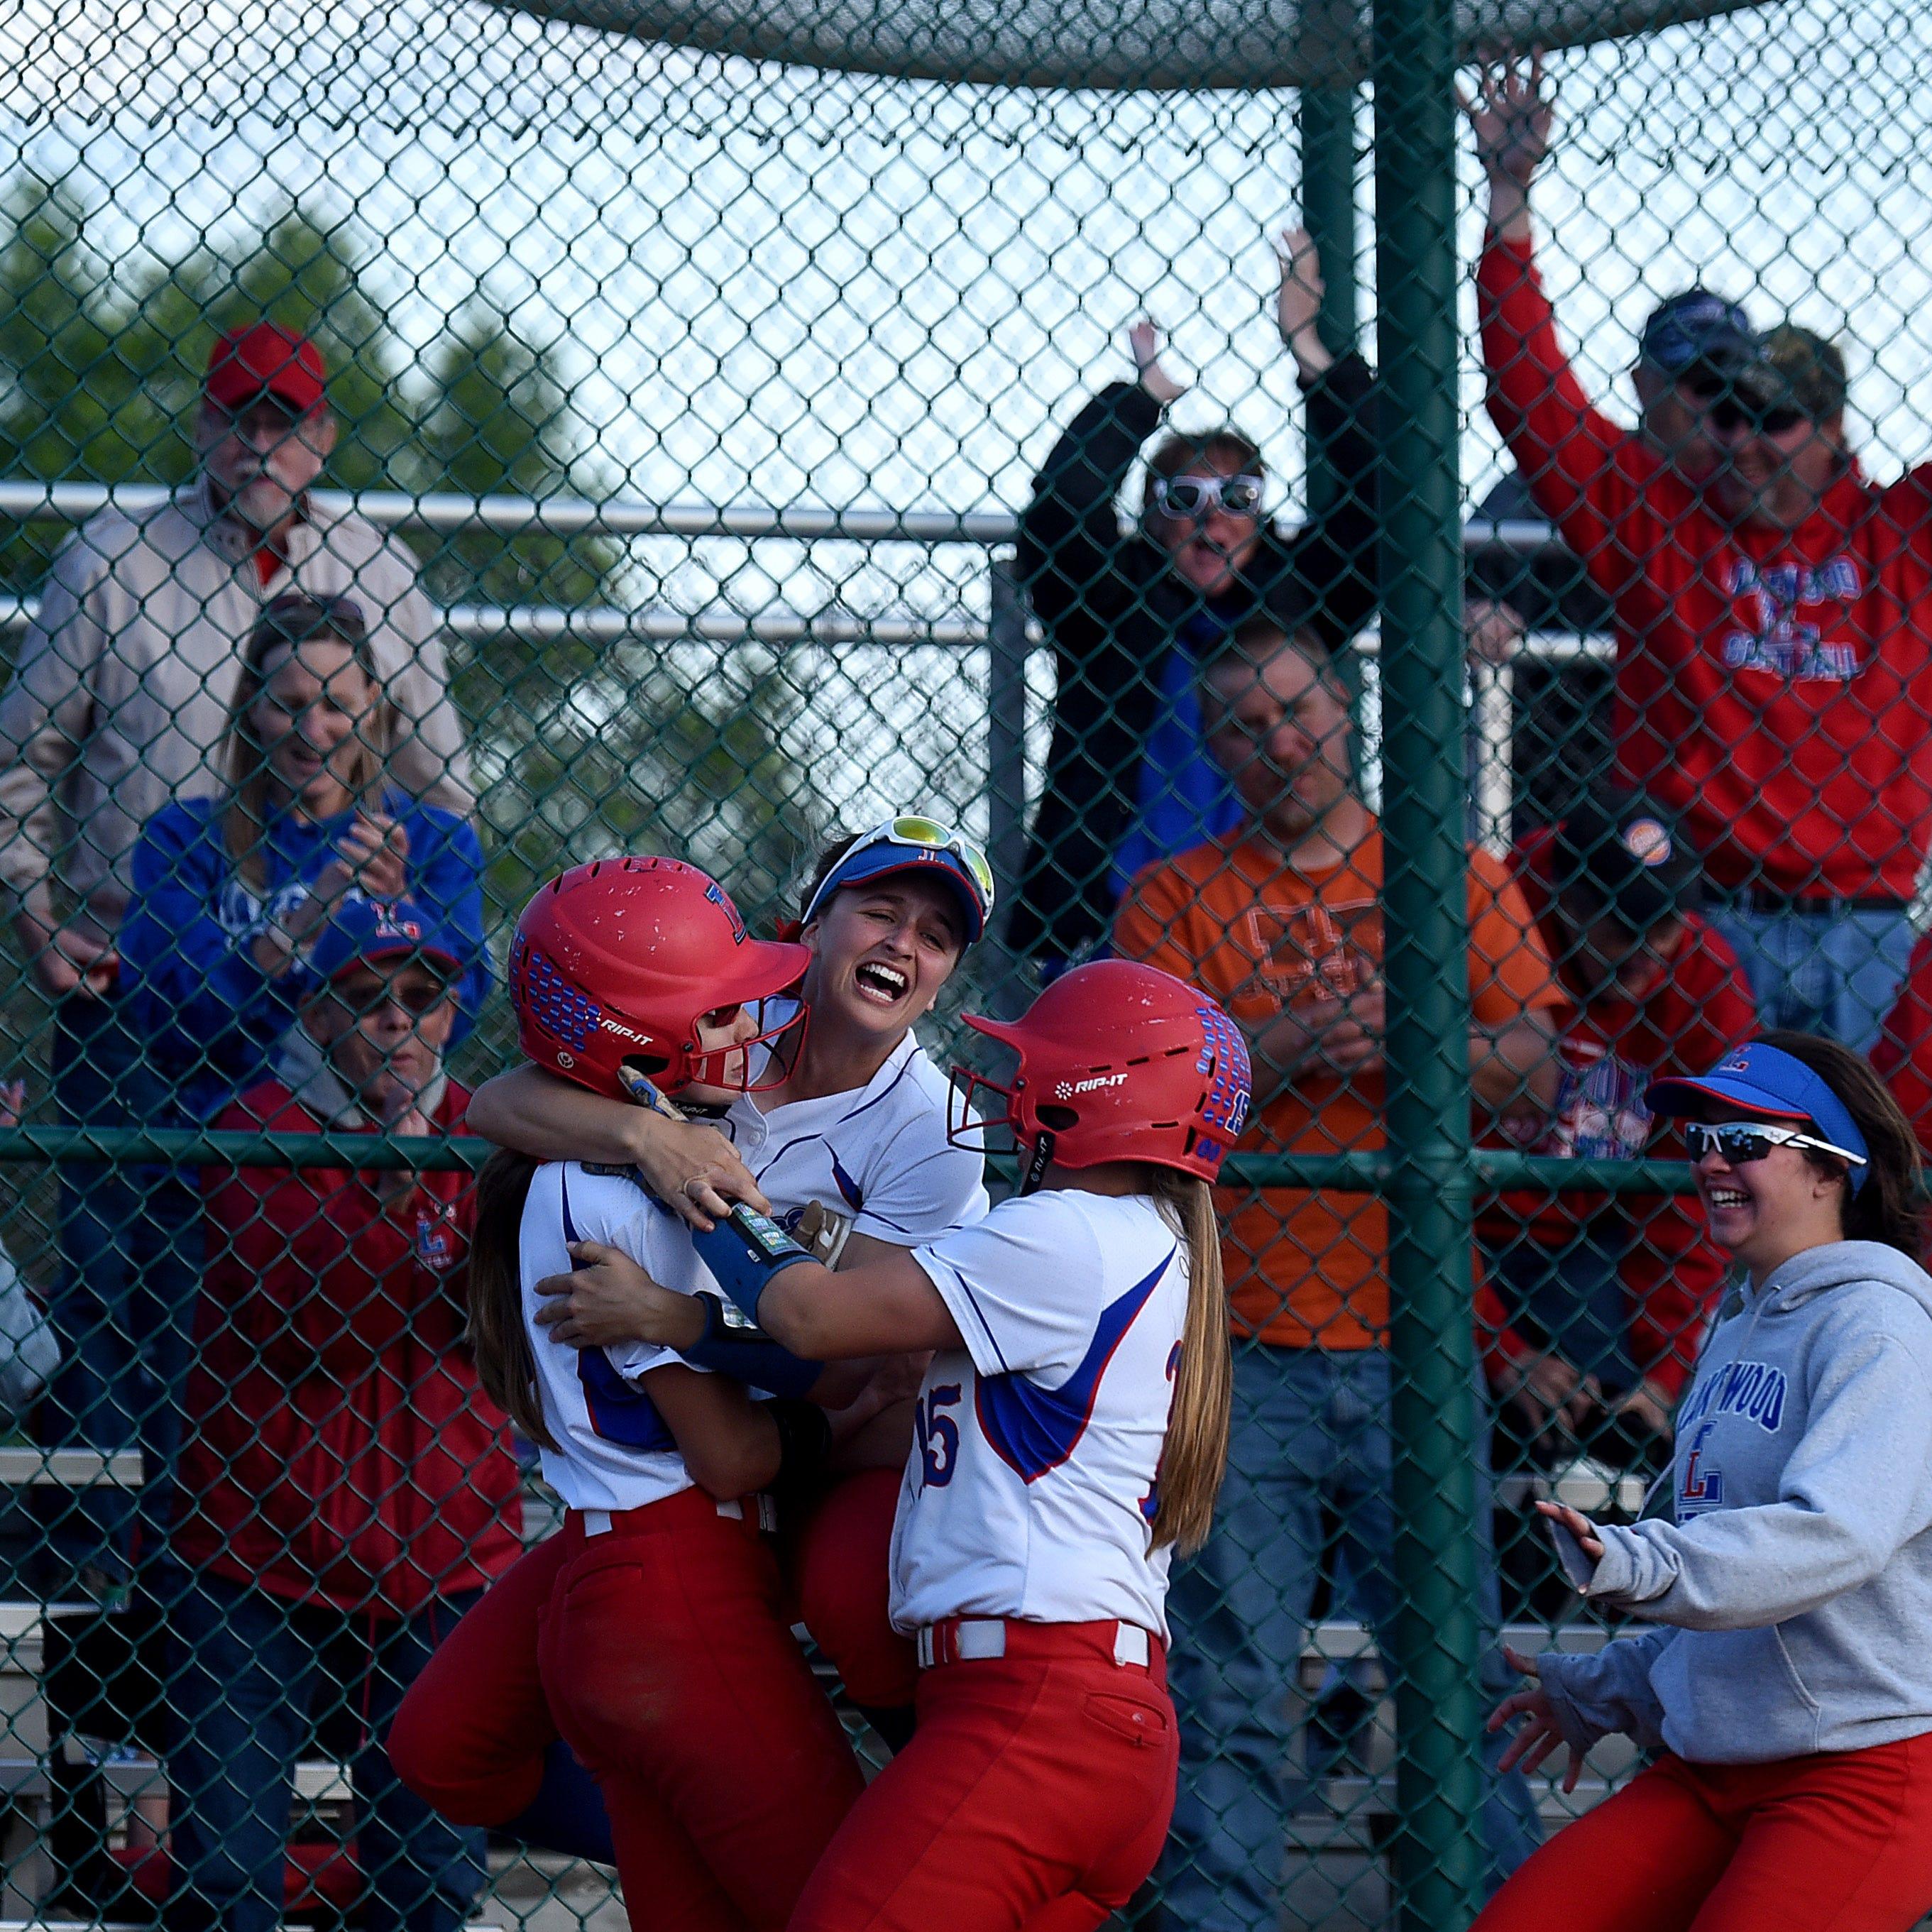 Braskie's big bat allows Lakewood to survive softball scare